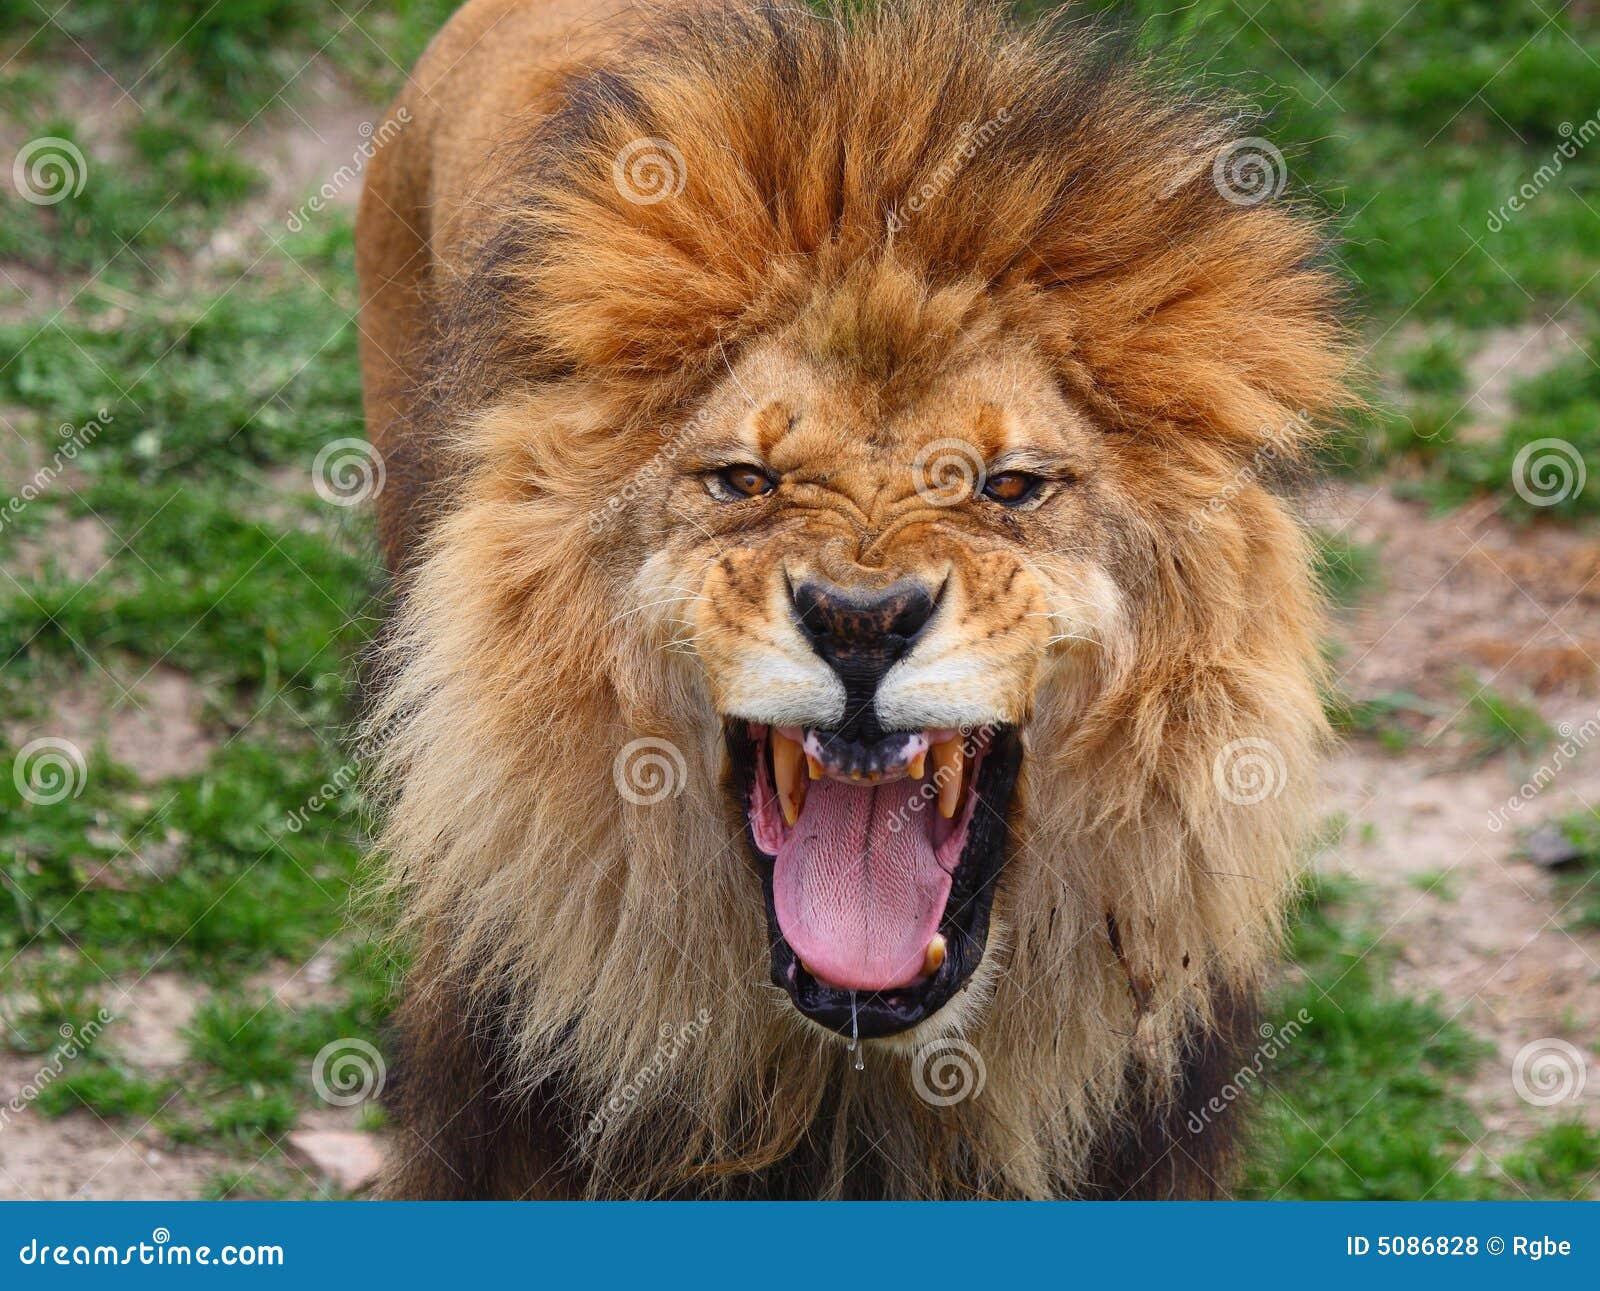 Lion roar face